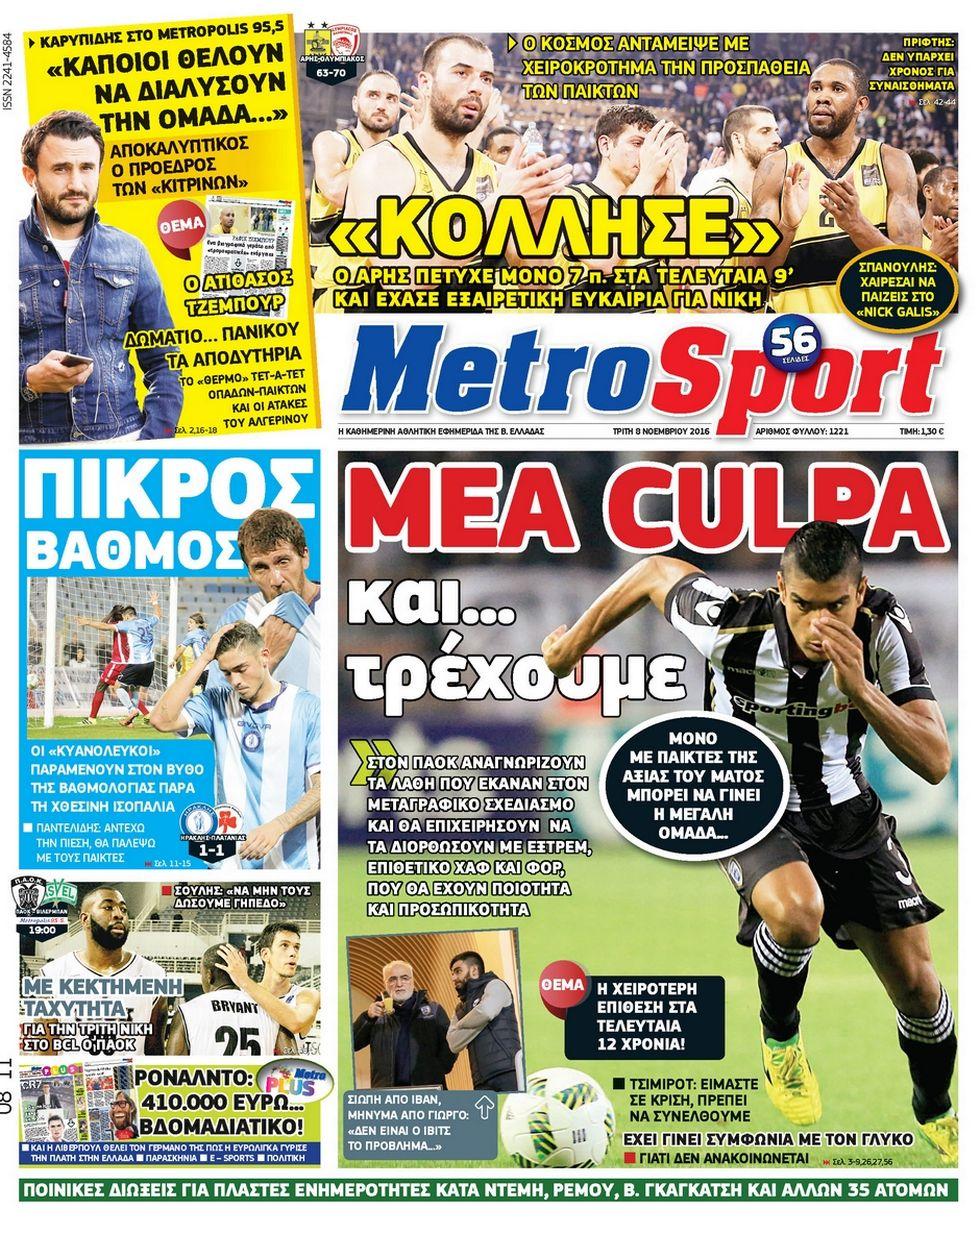 metrosport-08-11-2016